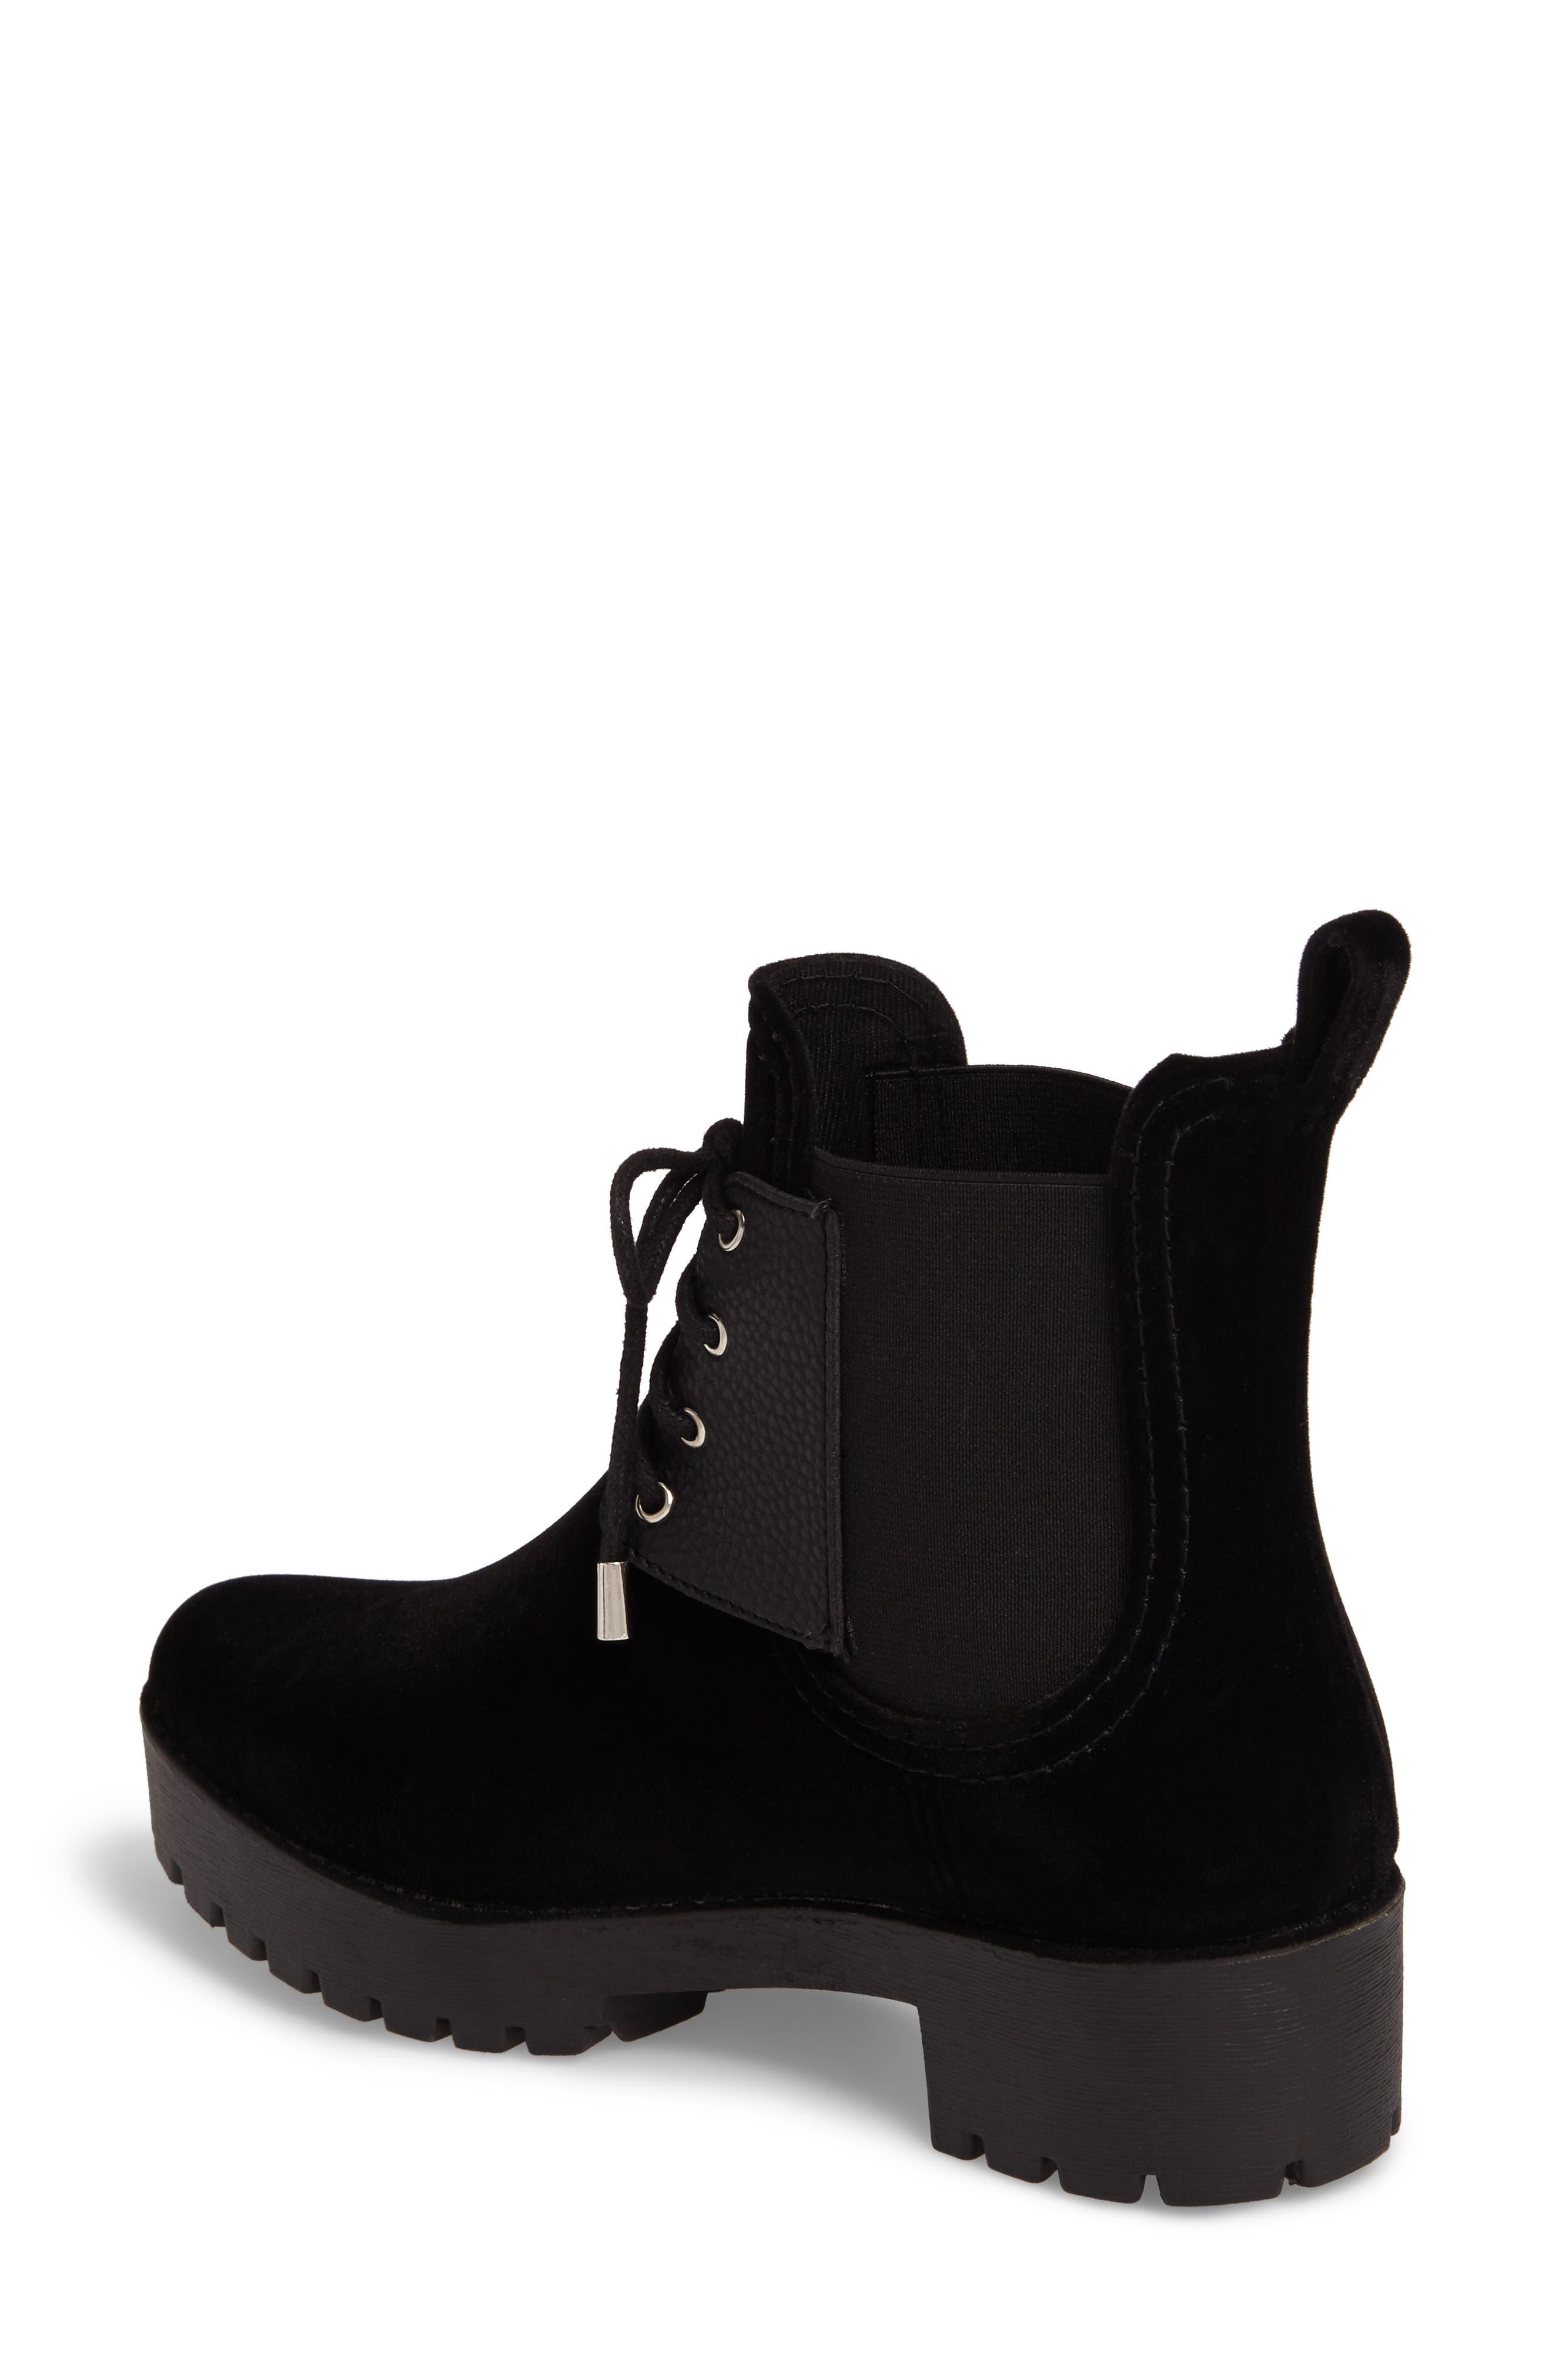 Leeds Lace-Up Waterproof Boot,                             Alternate thumbnail 2, color,                             BLACK